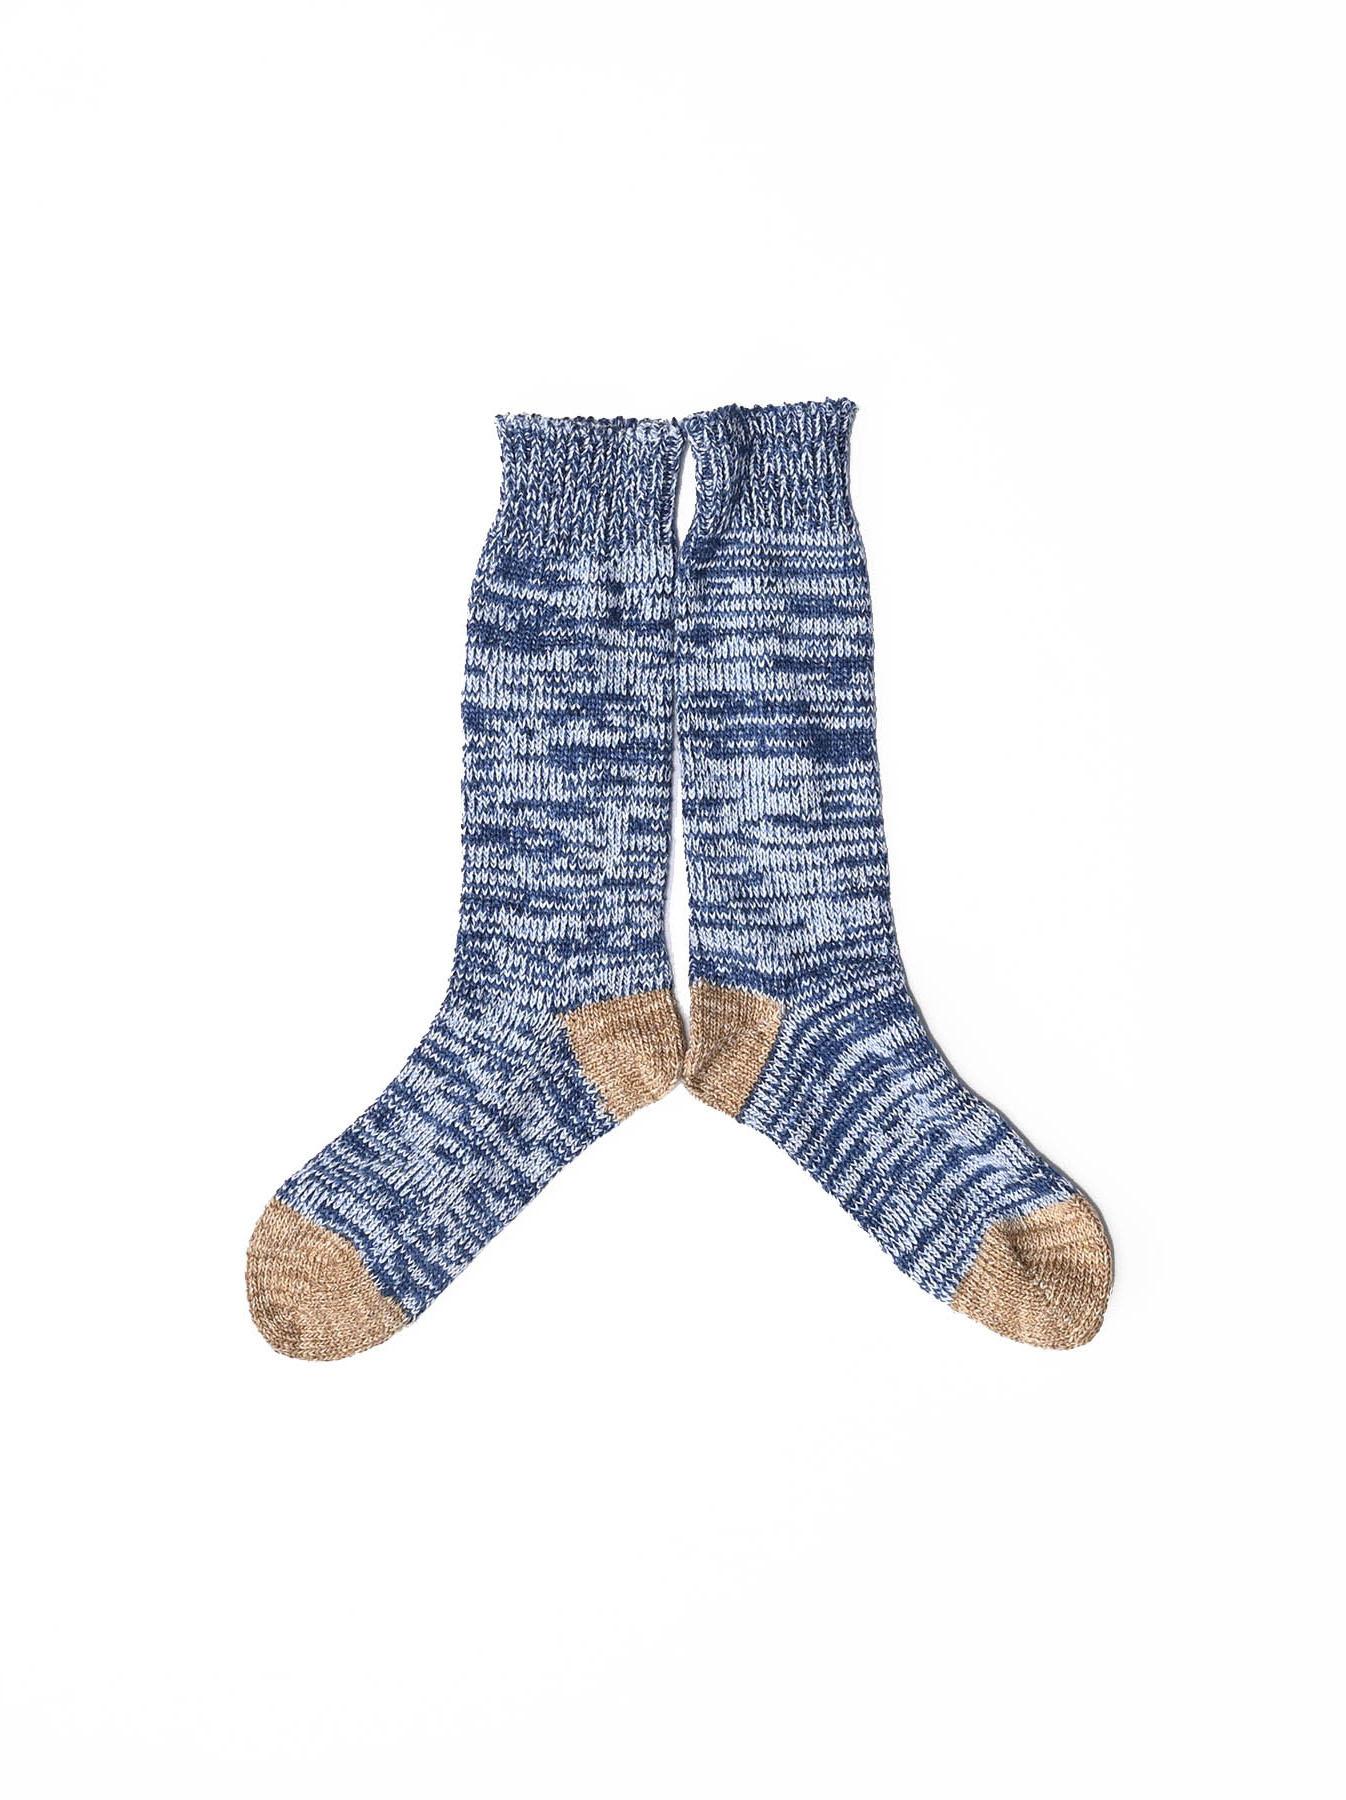 Indigo Mokumoku Socks-1